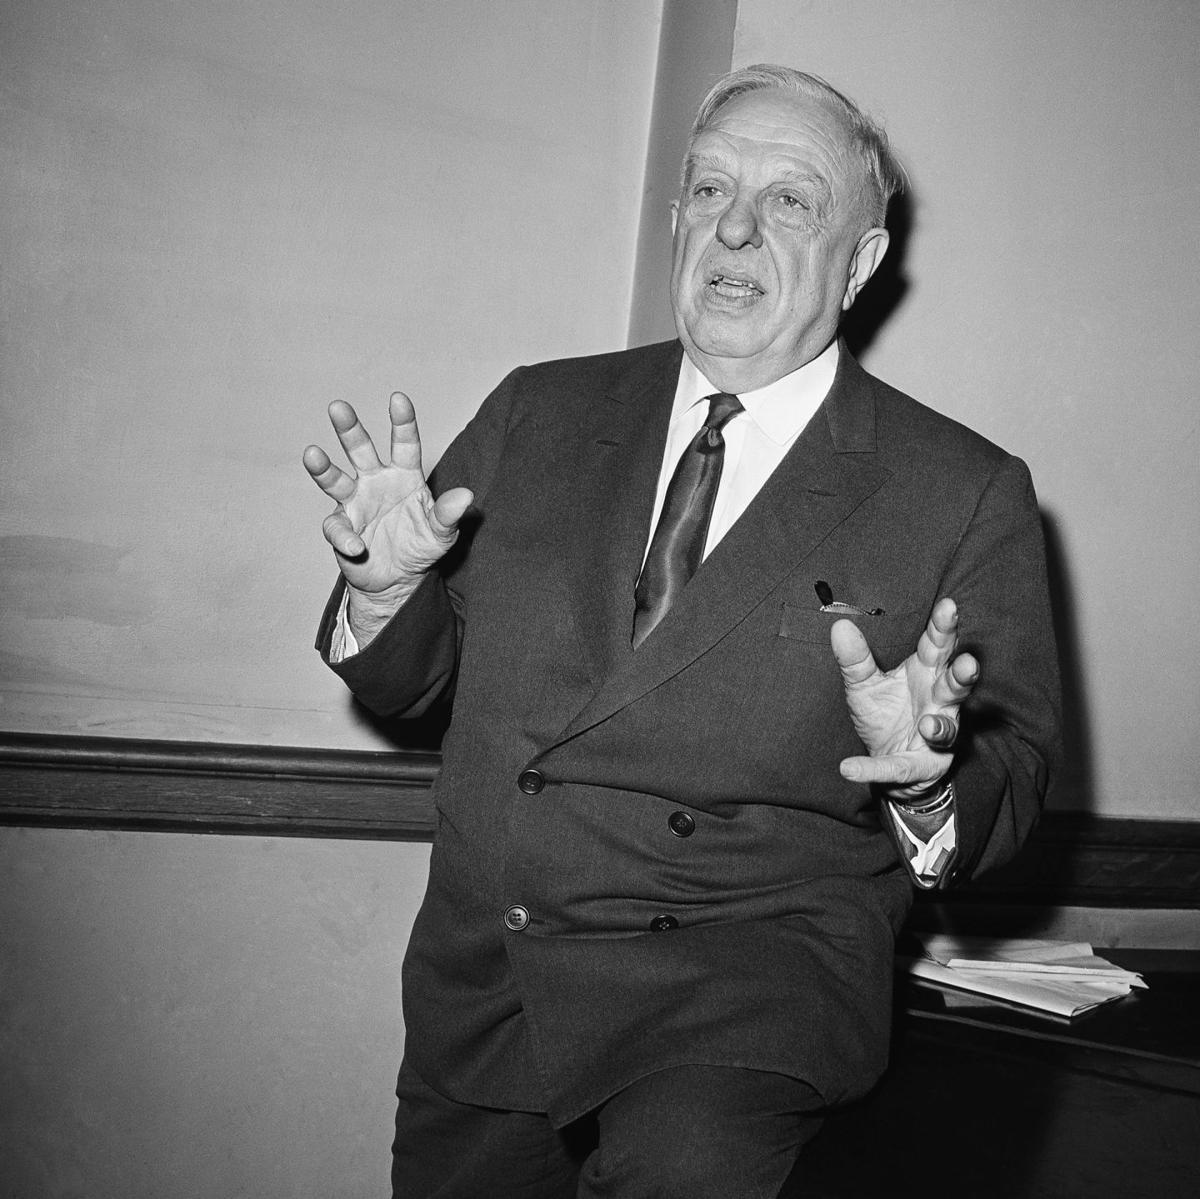 Maurice Podoloff